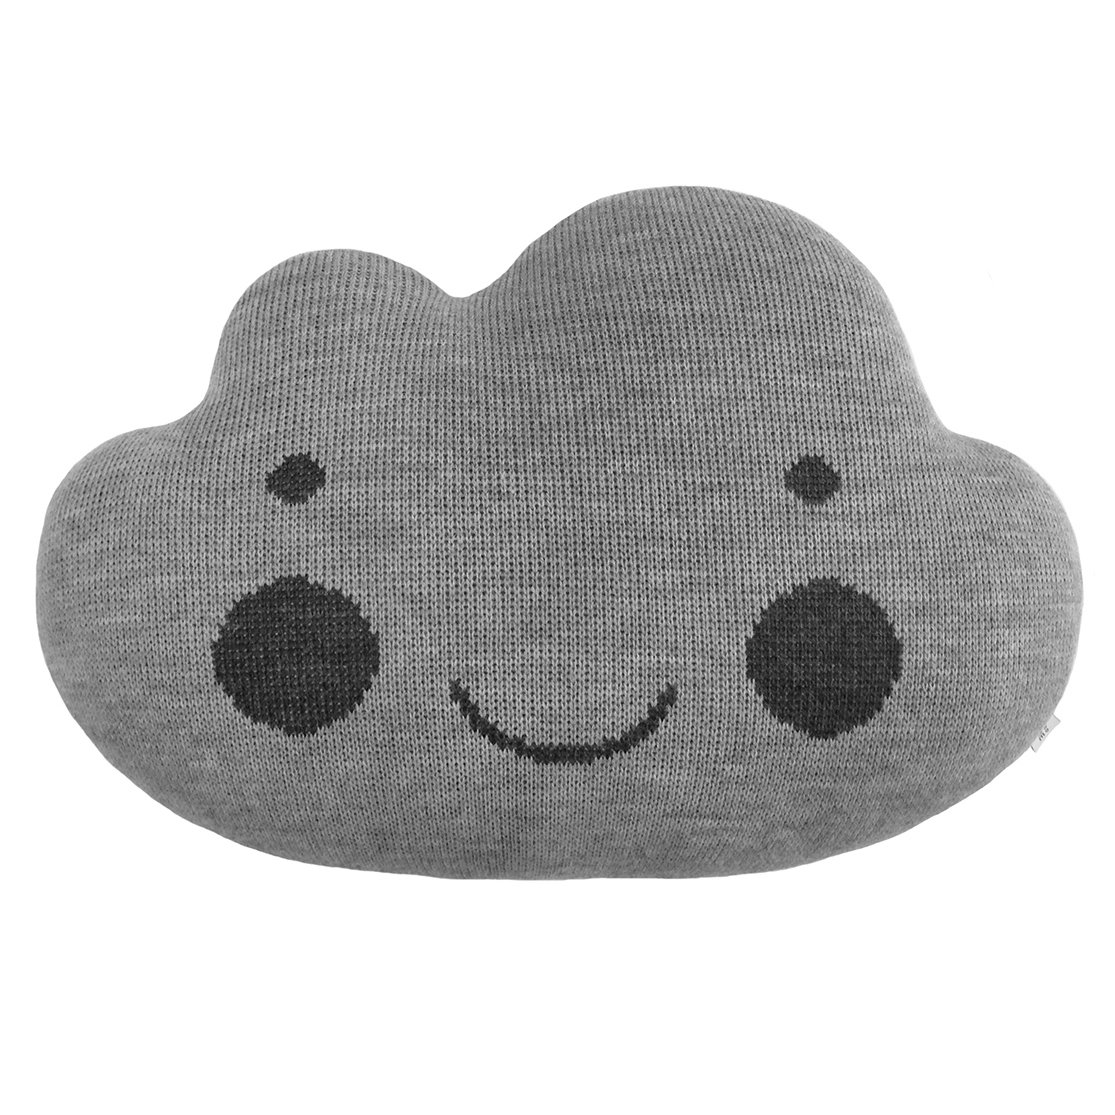 Подушка-облако серая монохром